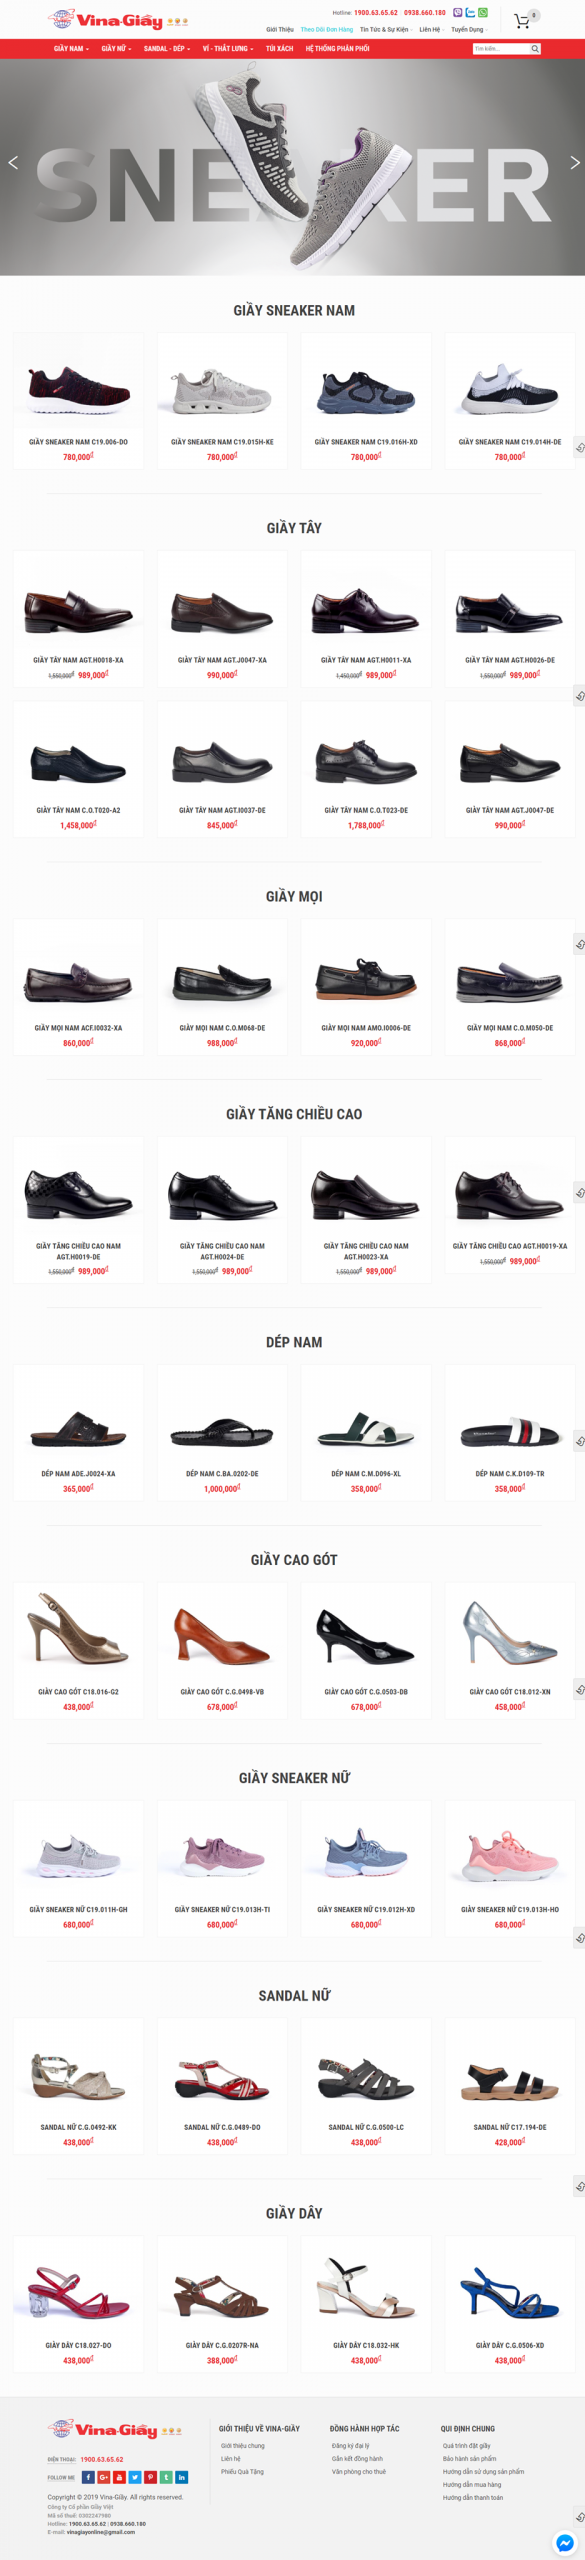 website bán dày dép